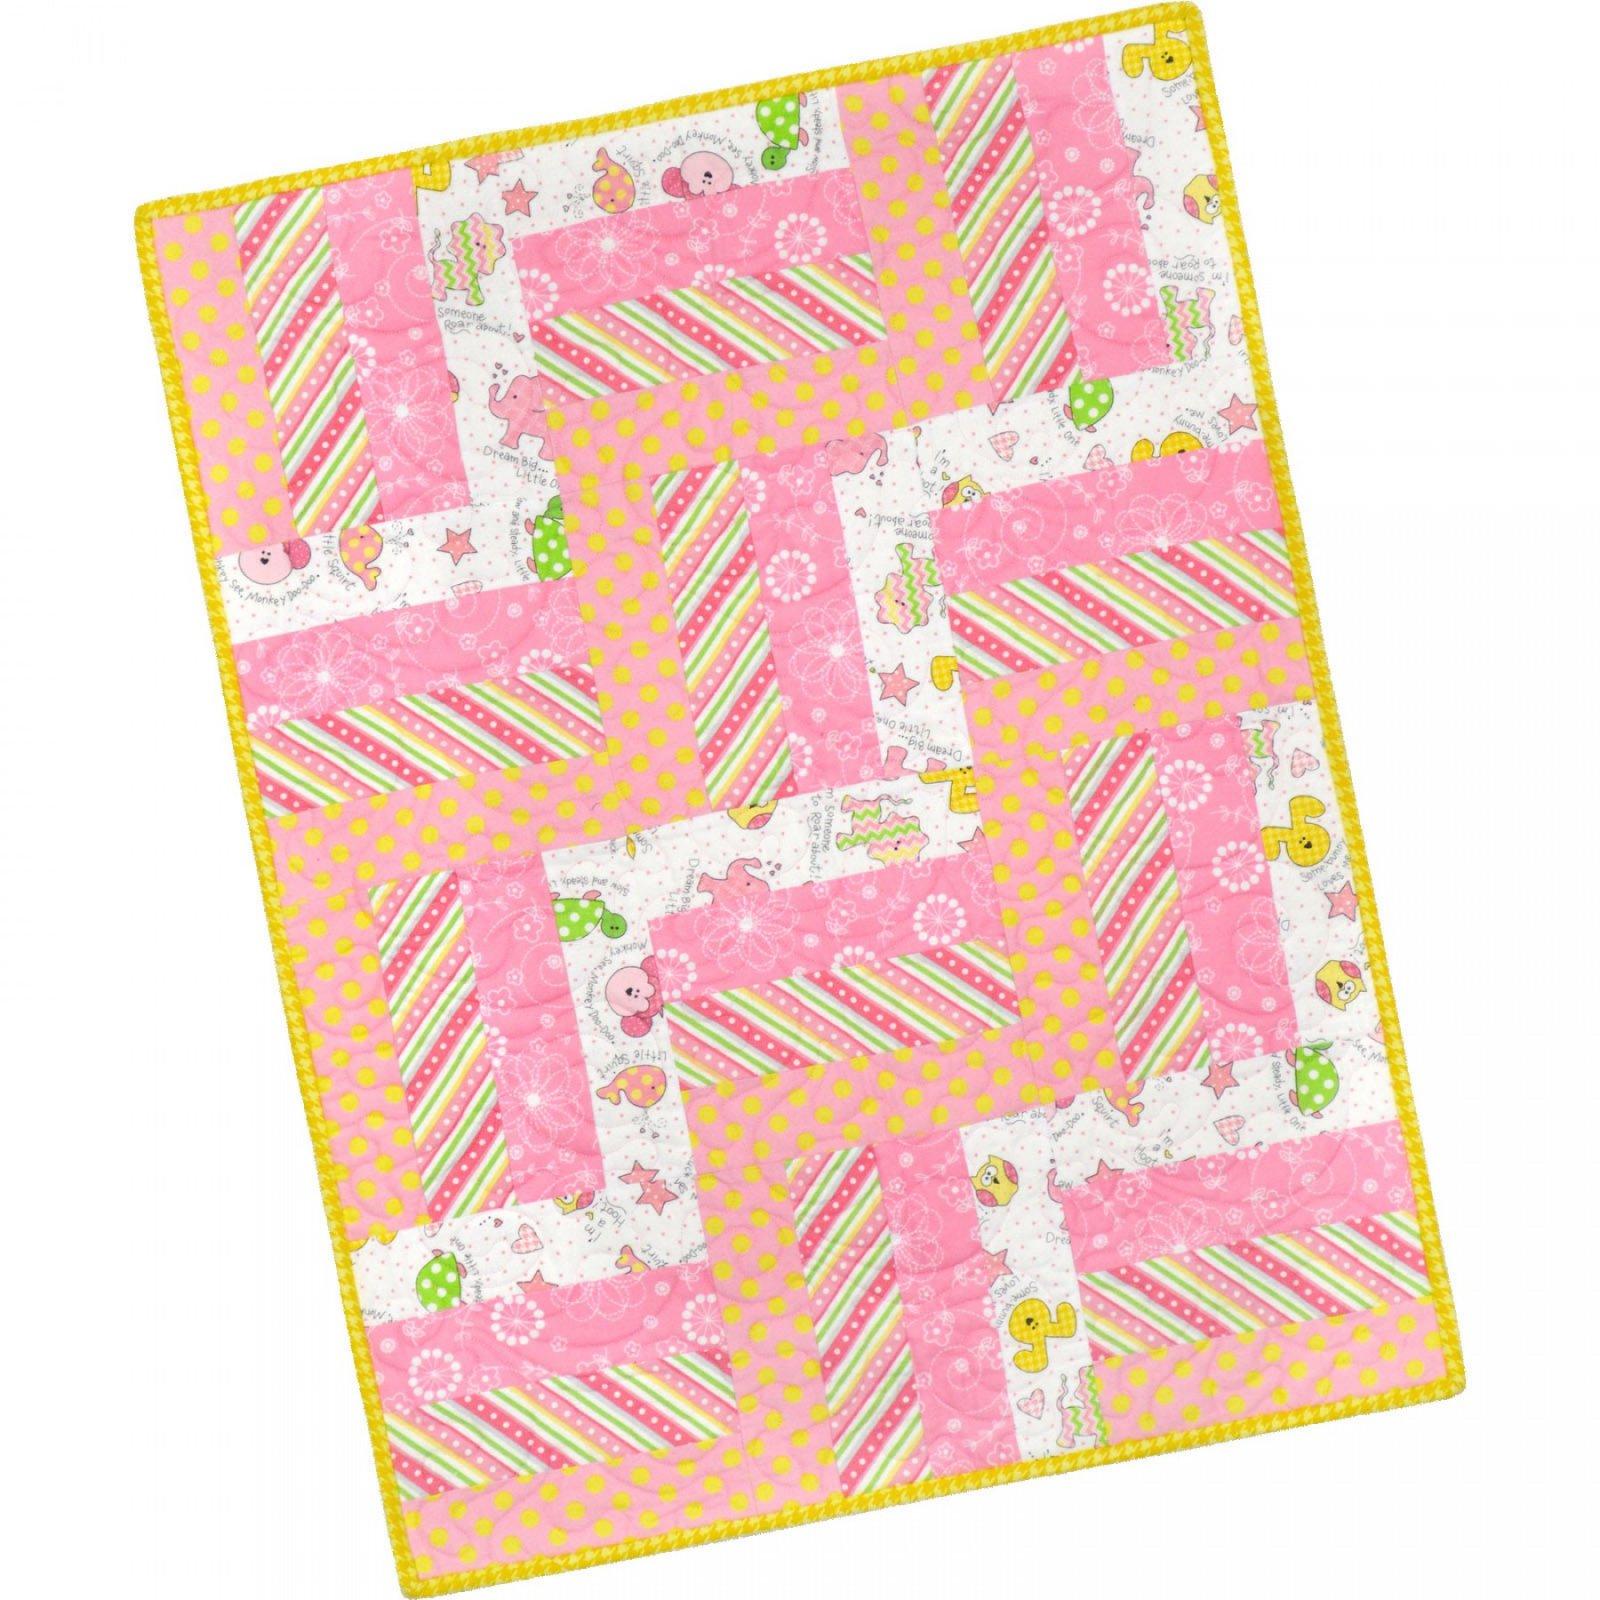 Maywood Studio Pods Easy Peasy Precut Kit Little One Pink Kids Flannel Quilt Kit